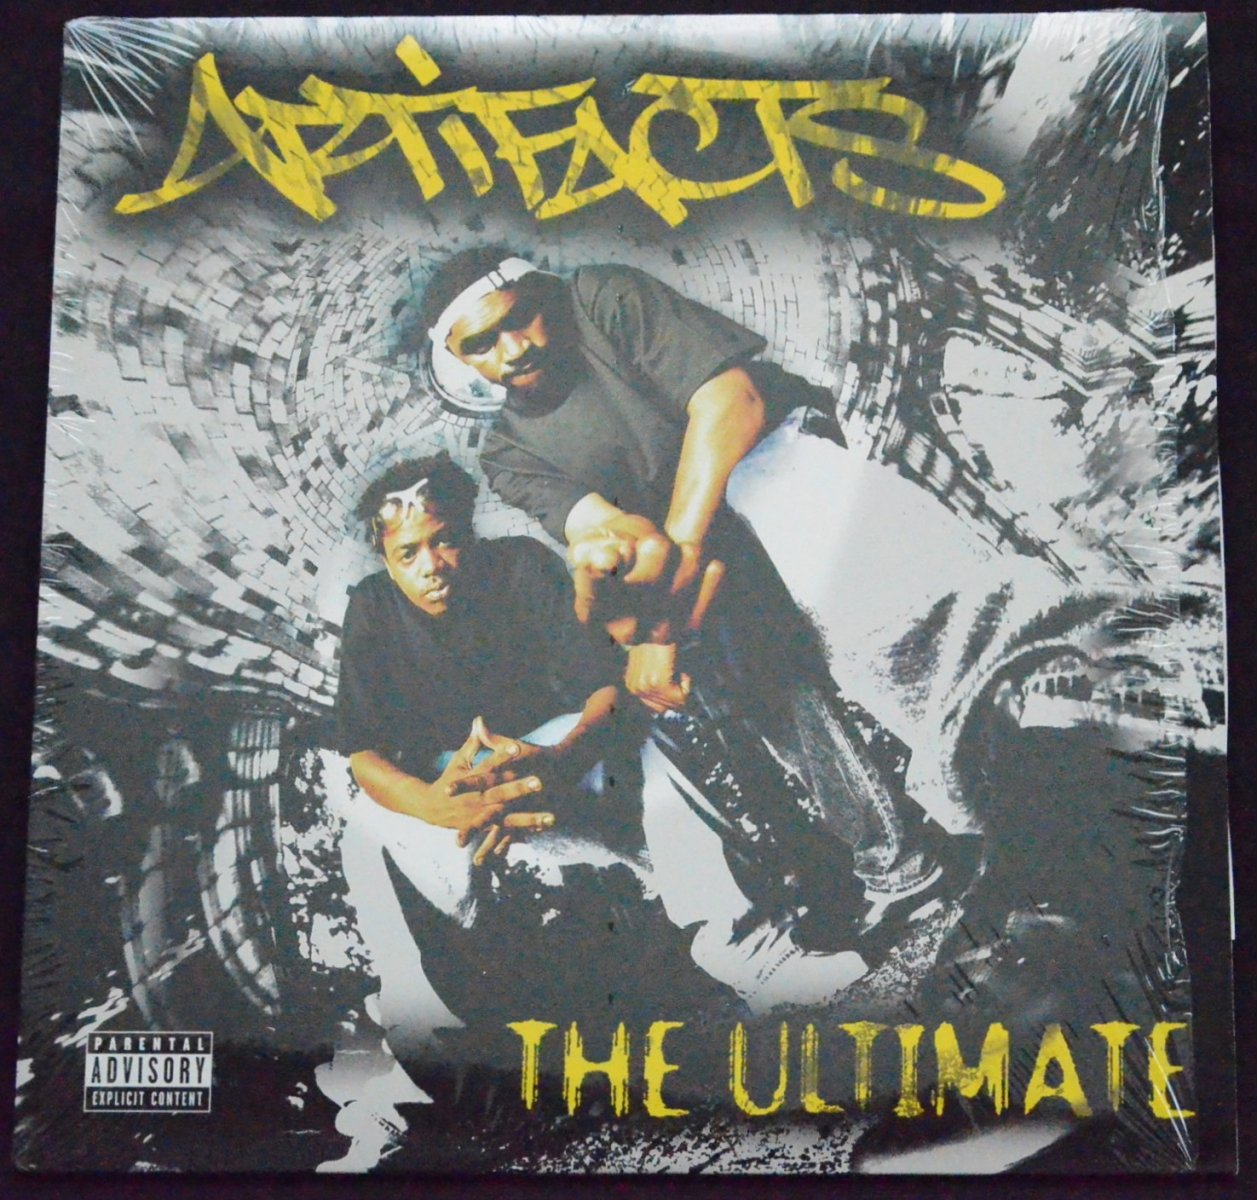 ARTIFACTS / THE ULTIMATE (PROD BY BABY PAUL EX DA BEATMINERZ) / SHOWBIZ REMIX (12